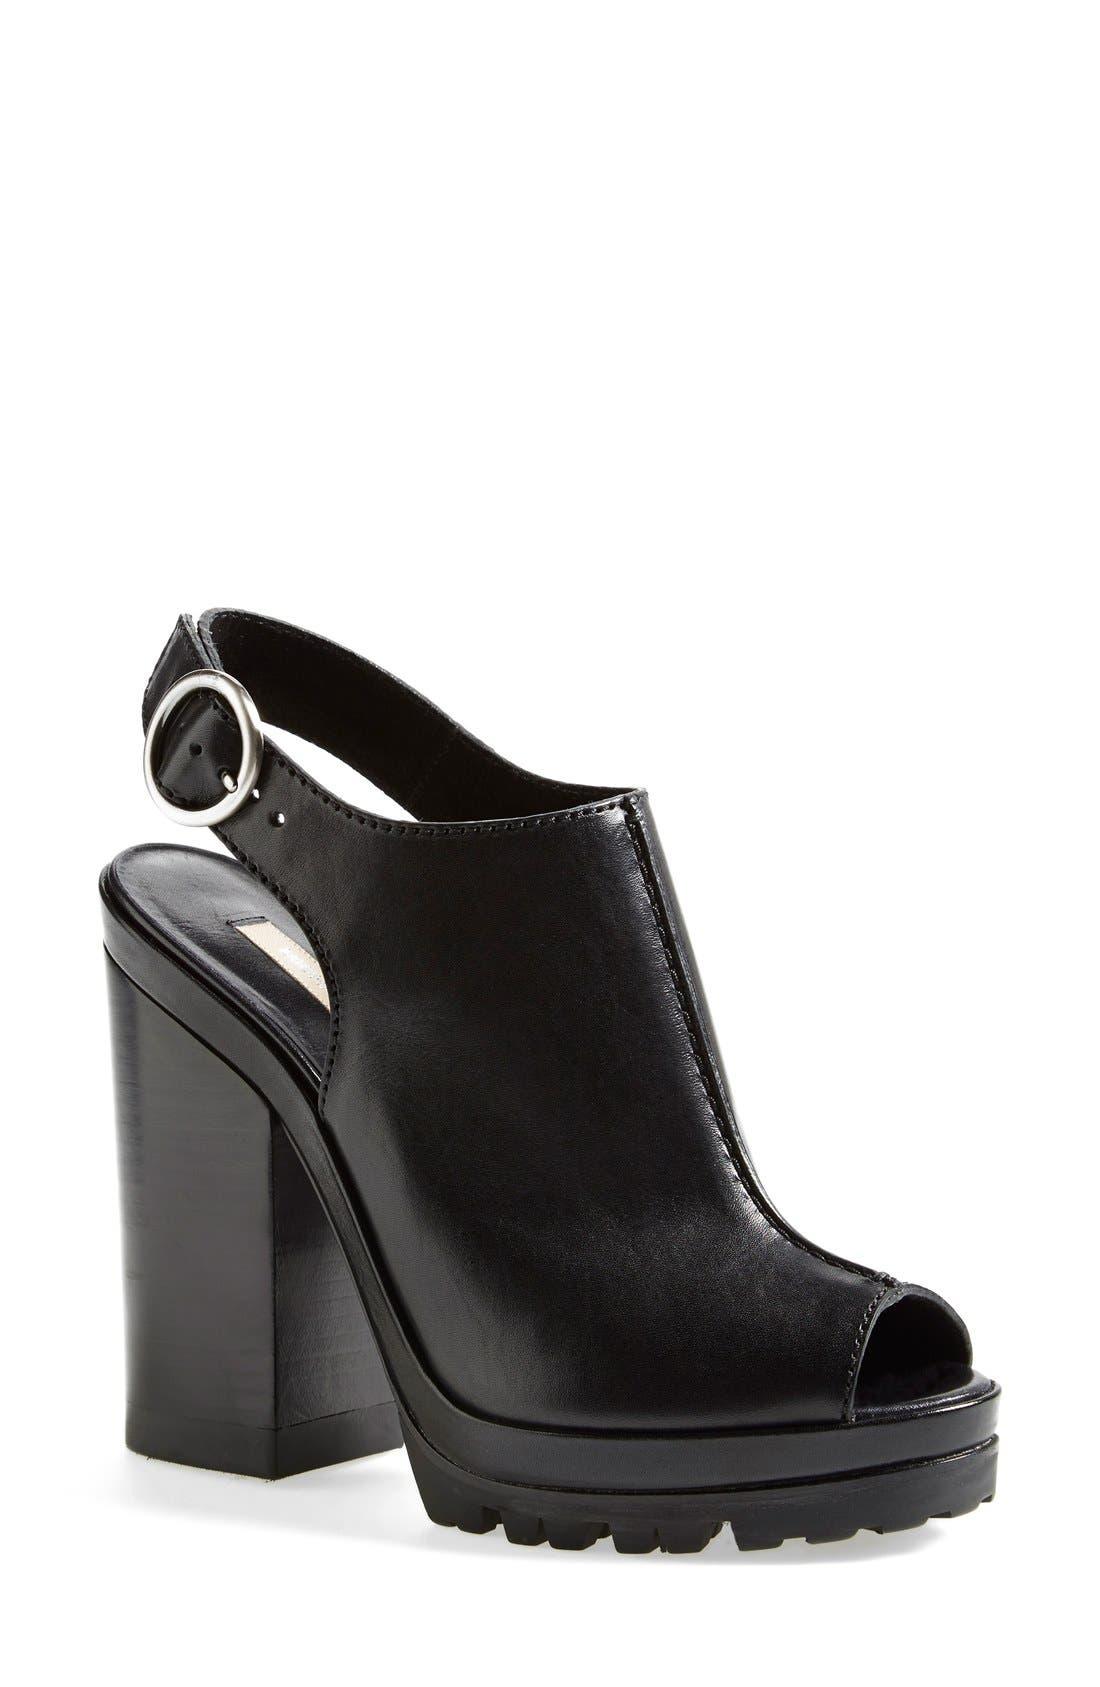 Alternate Image 1 Selected - Michael Kors 'Patras' Sandal (Women)